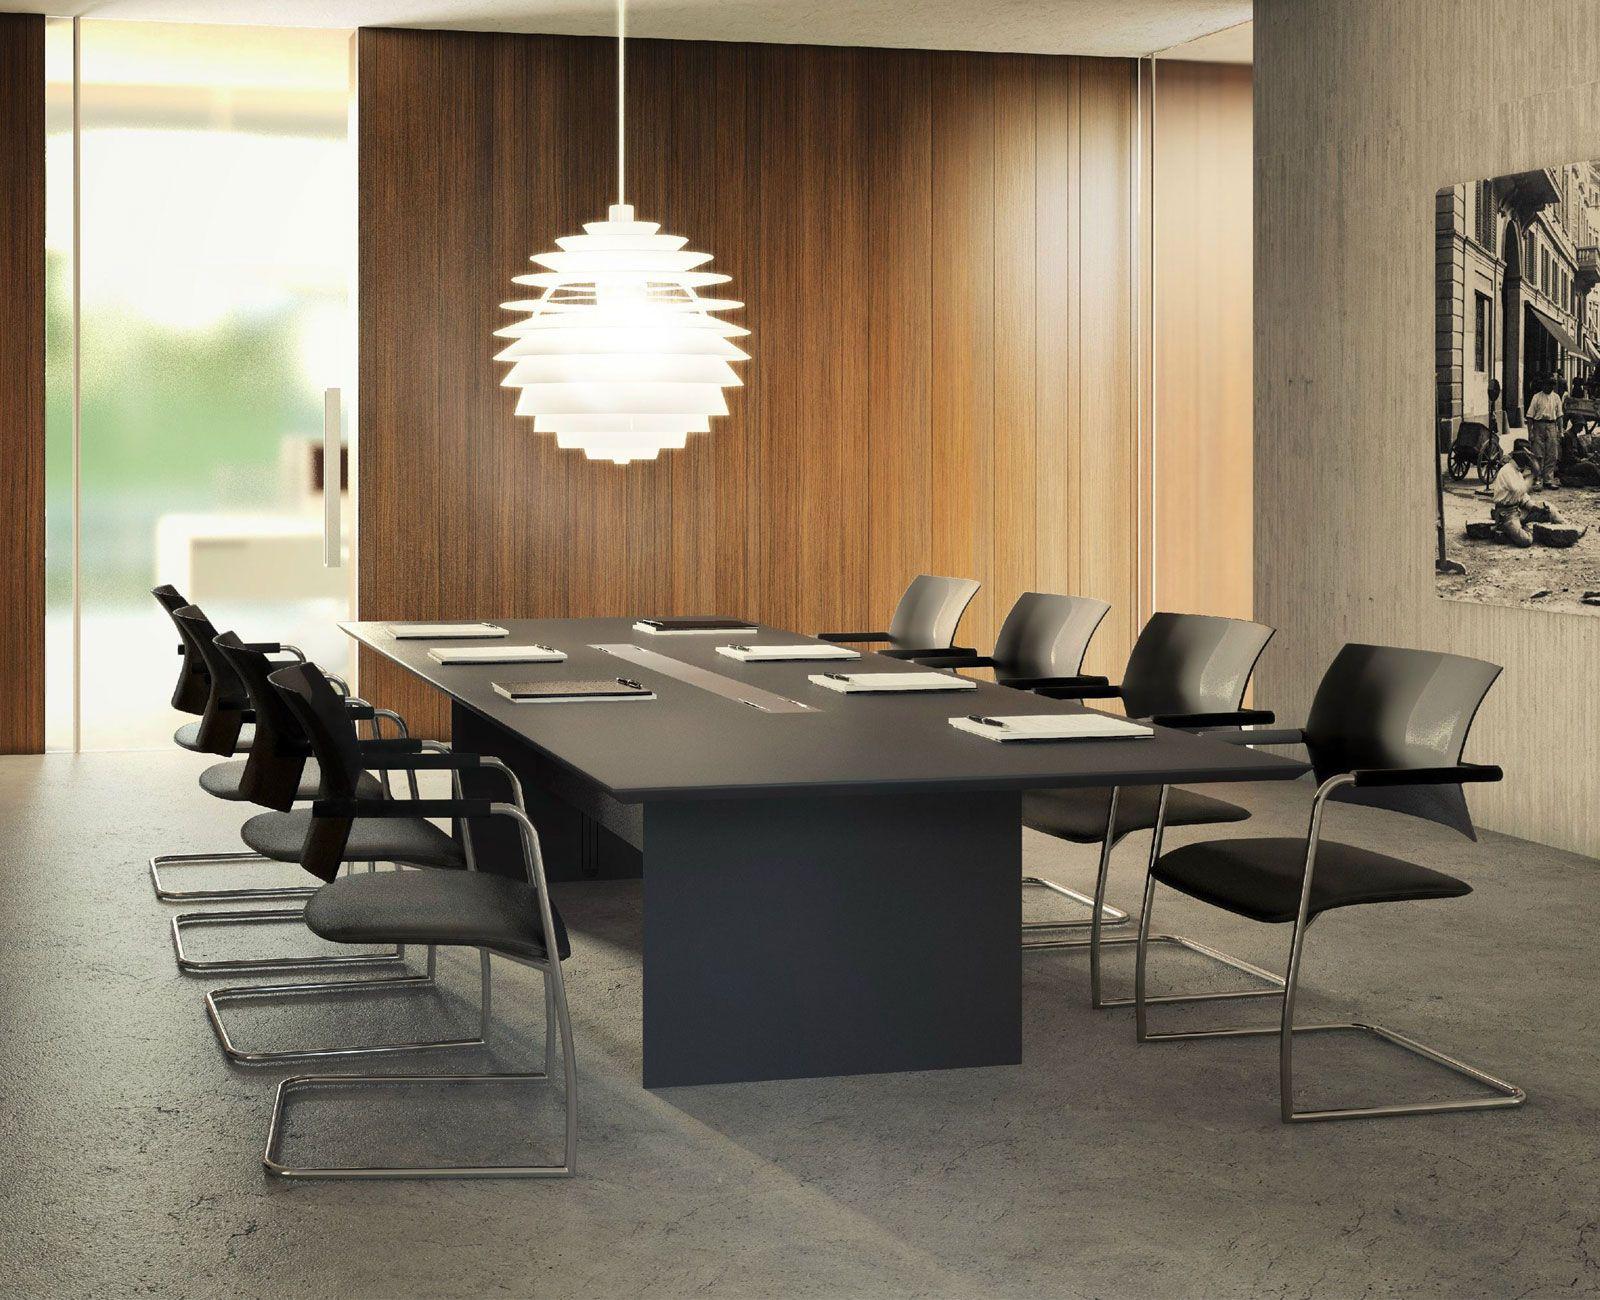 Quaranta5 Meeting Table Fantoni Forza Meeting Rooms Pinterest # Muebles Fantoni